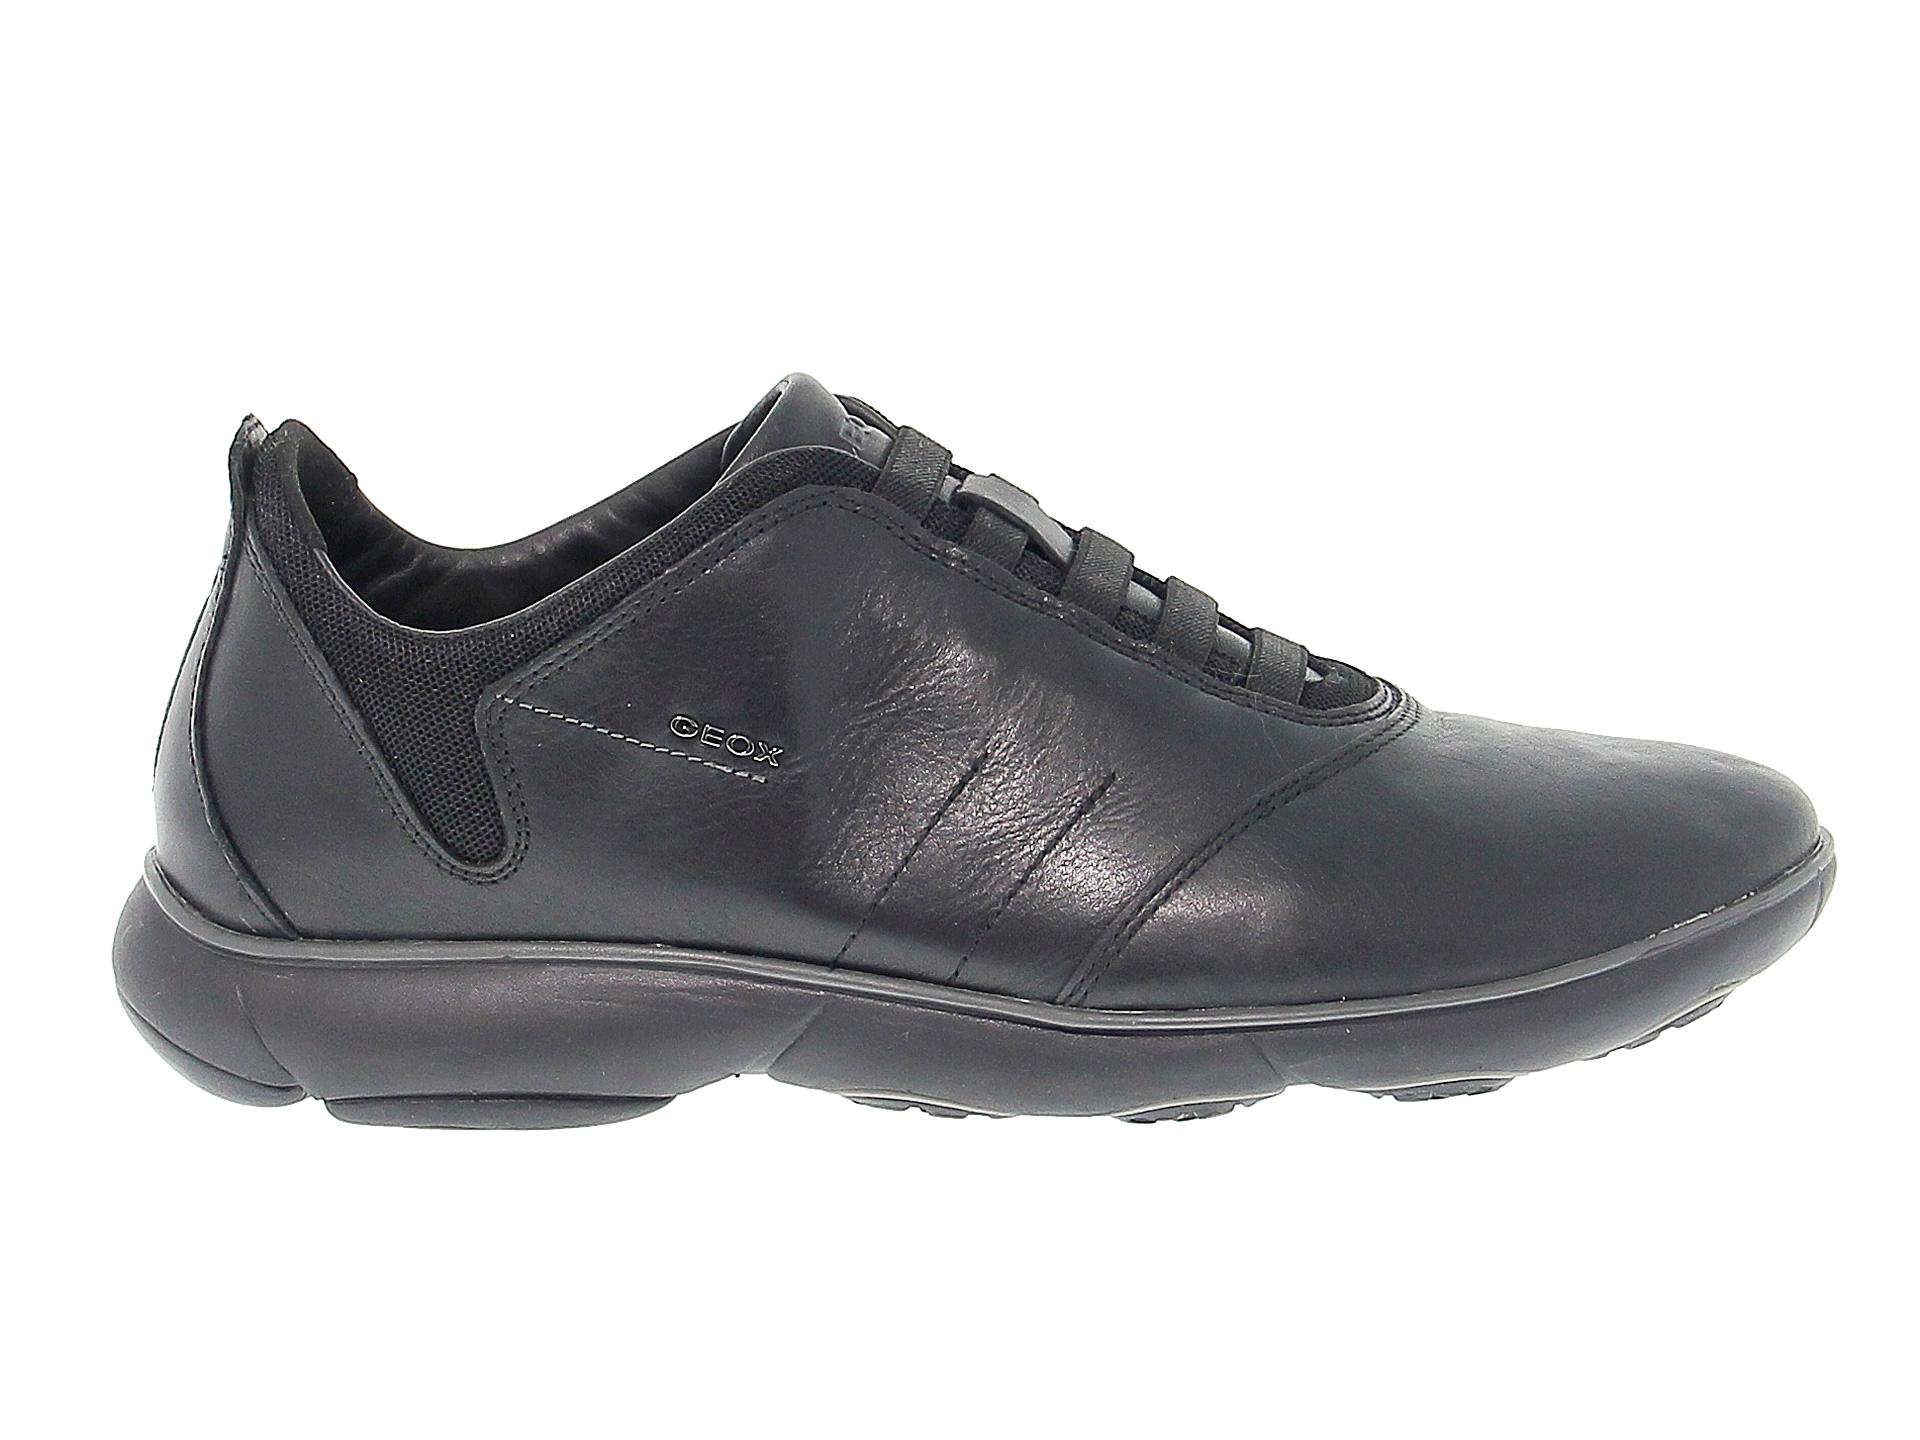 Scarpe da uomo Geox | Acquisti Online su eBay